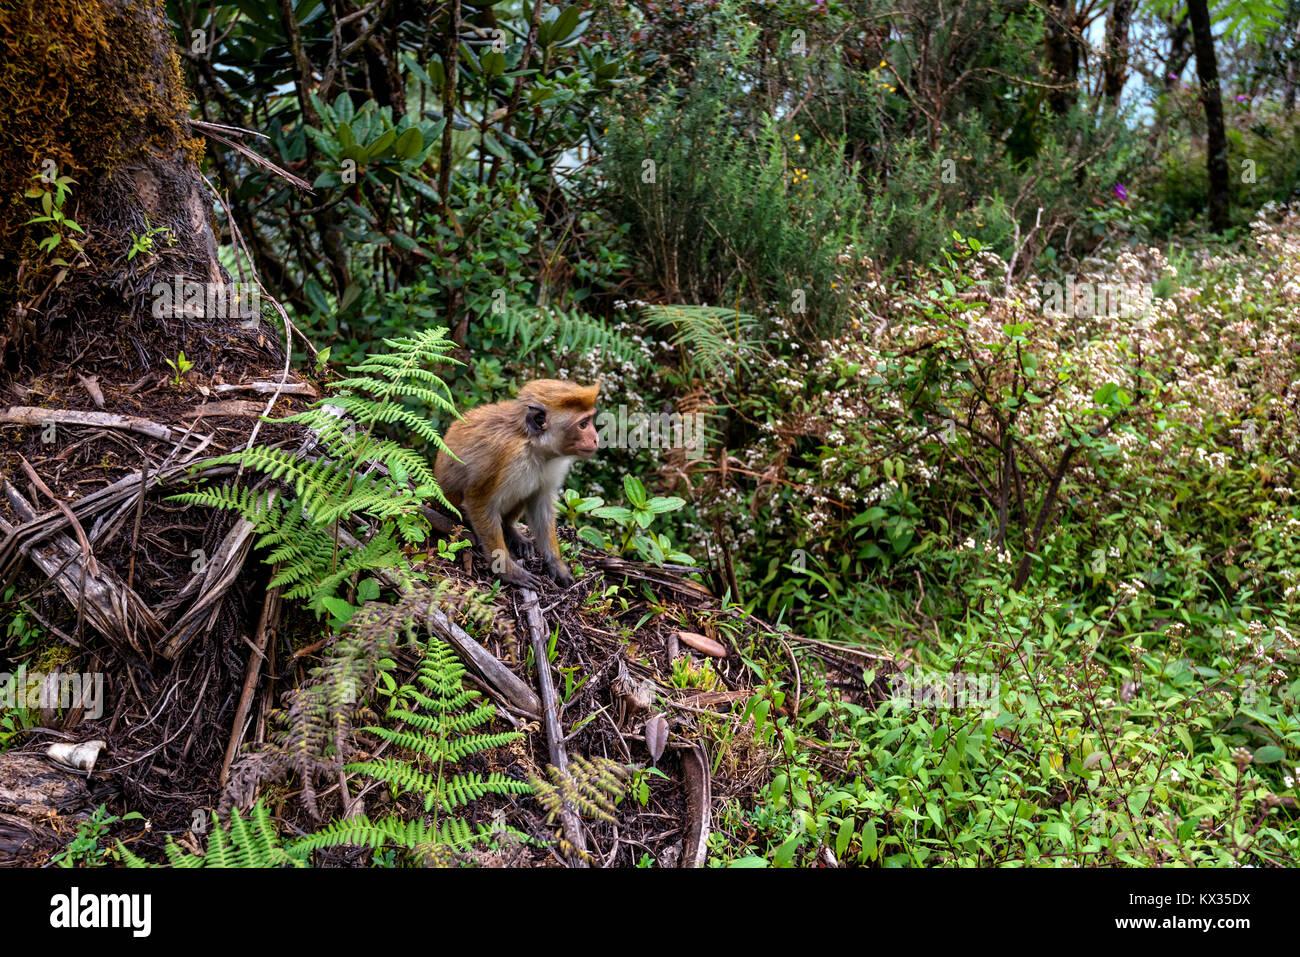 Srilankan toque macaque or Macaca sinica in jungle - Stock Image